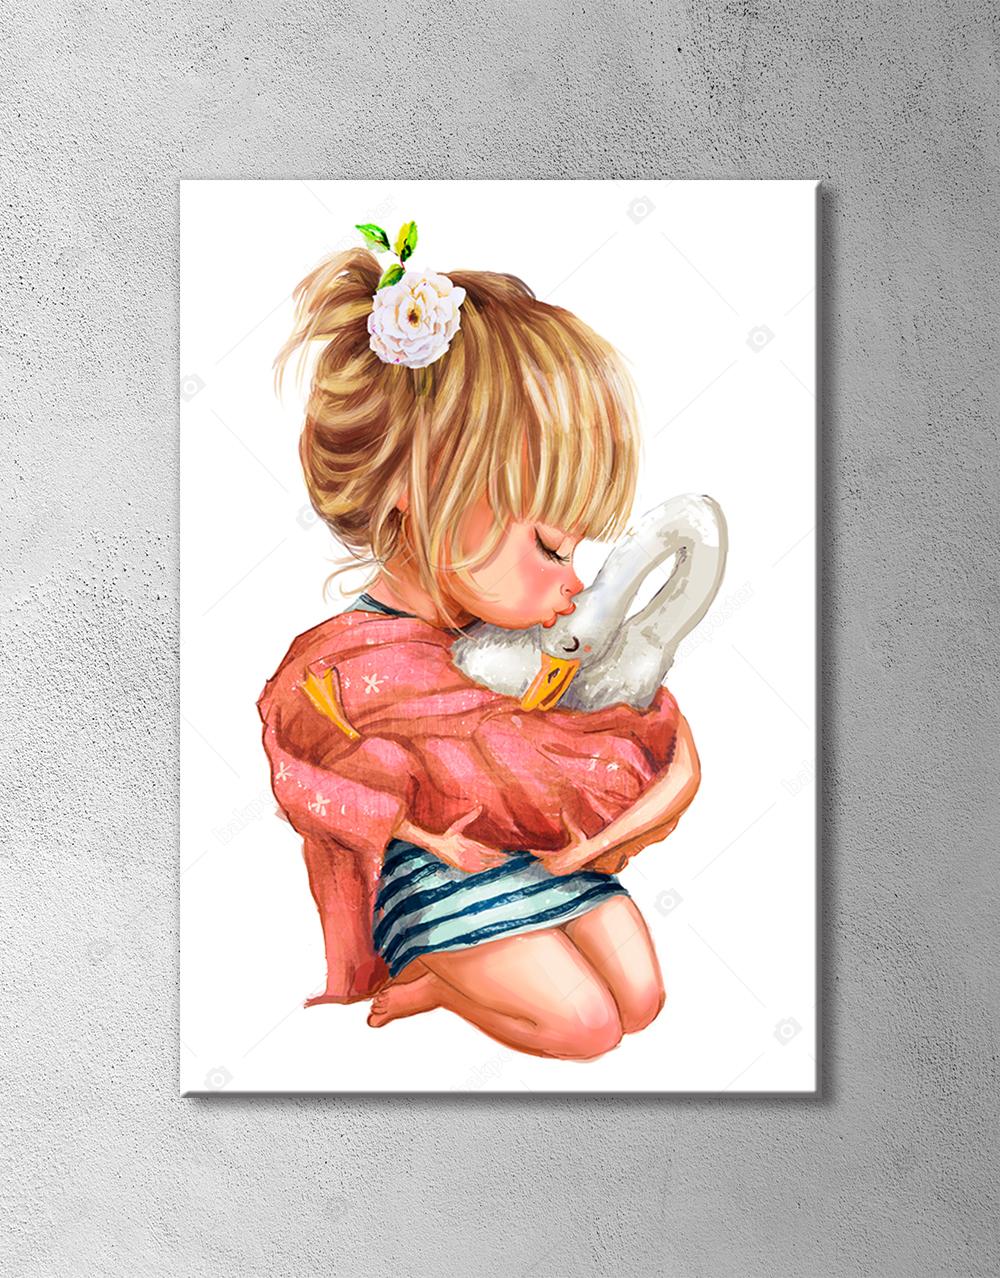 Sevimli Kız ile Kaz Çizim Poster